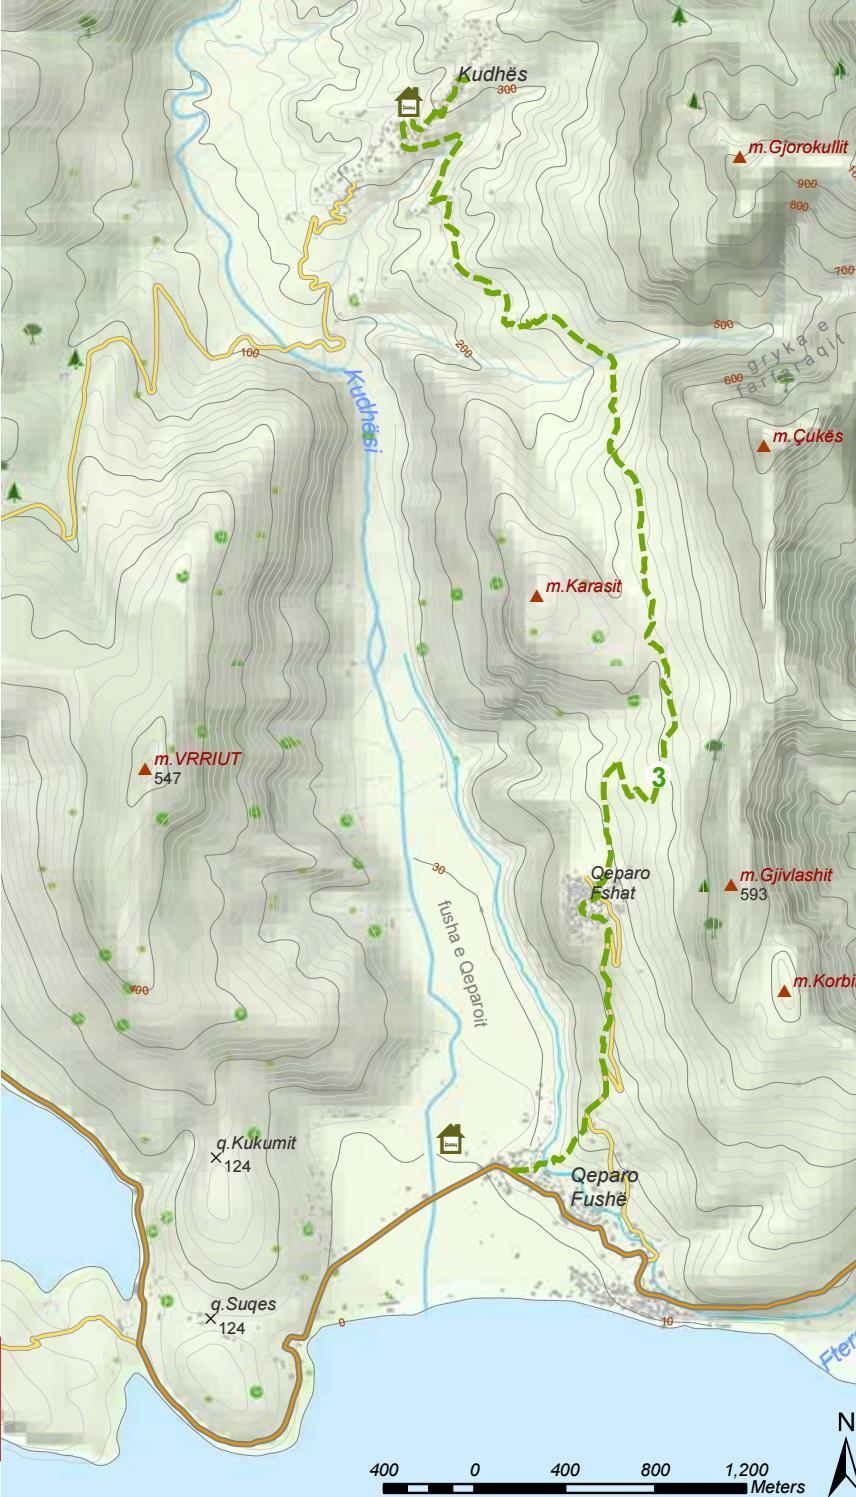 Hiking Trails in Himara Region page 27